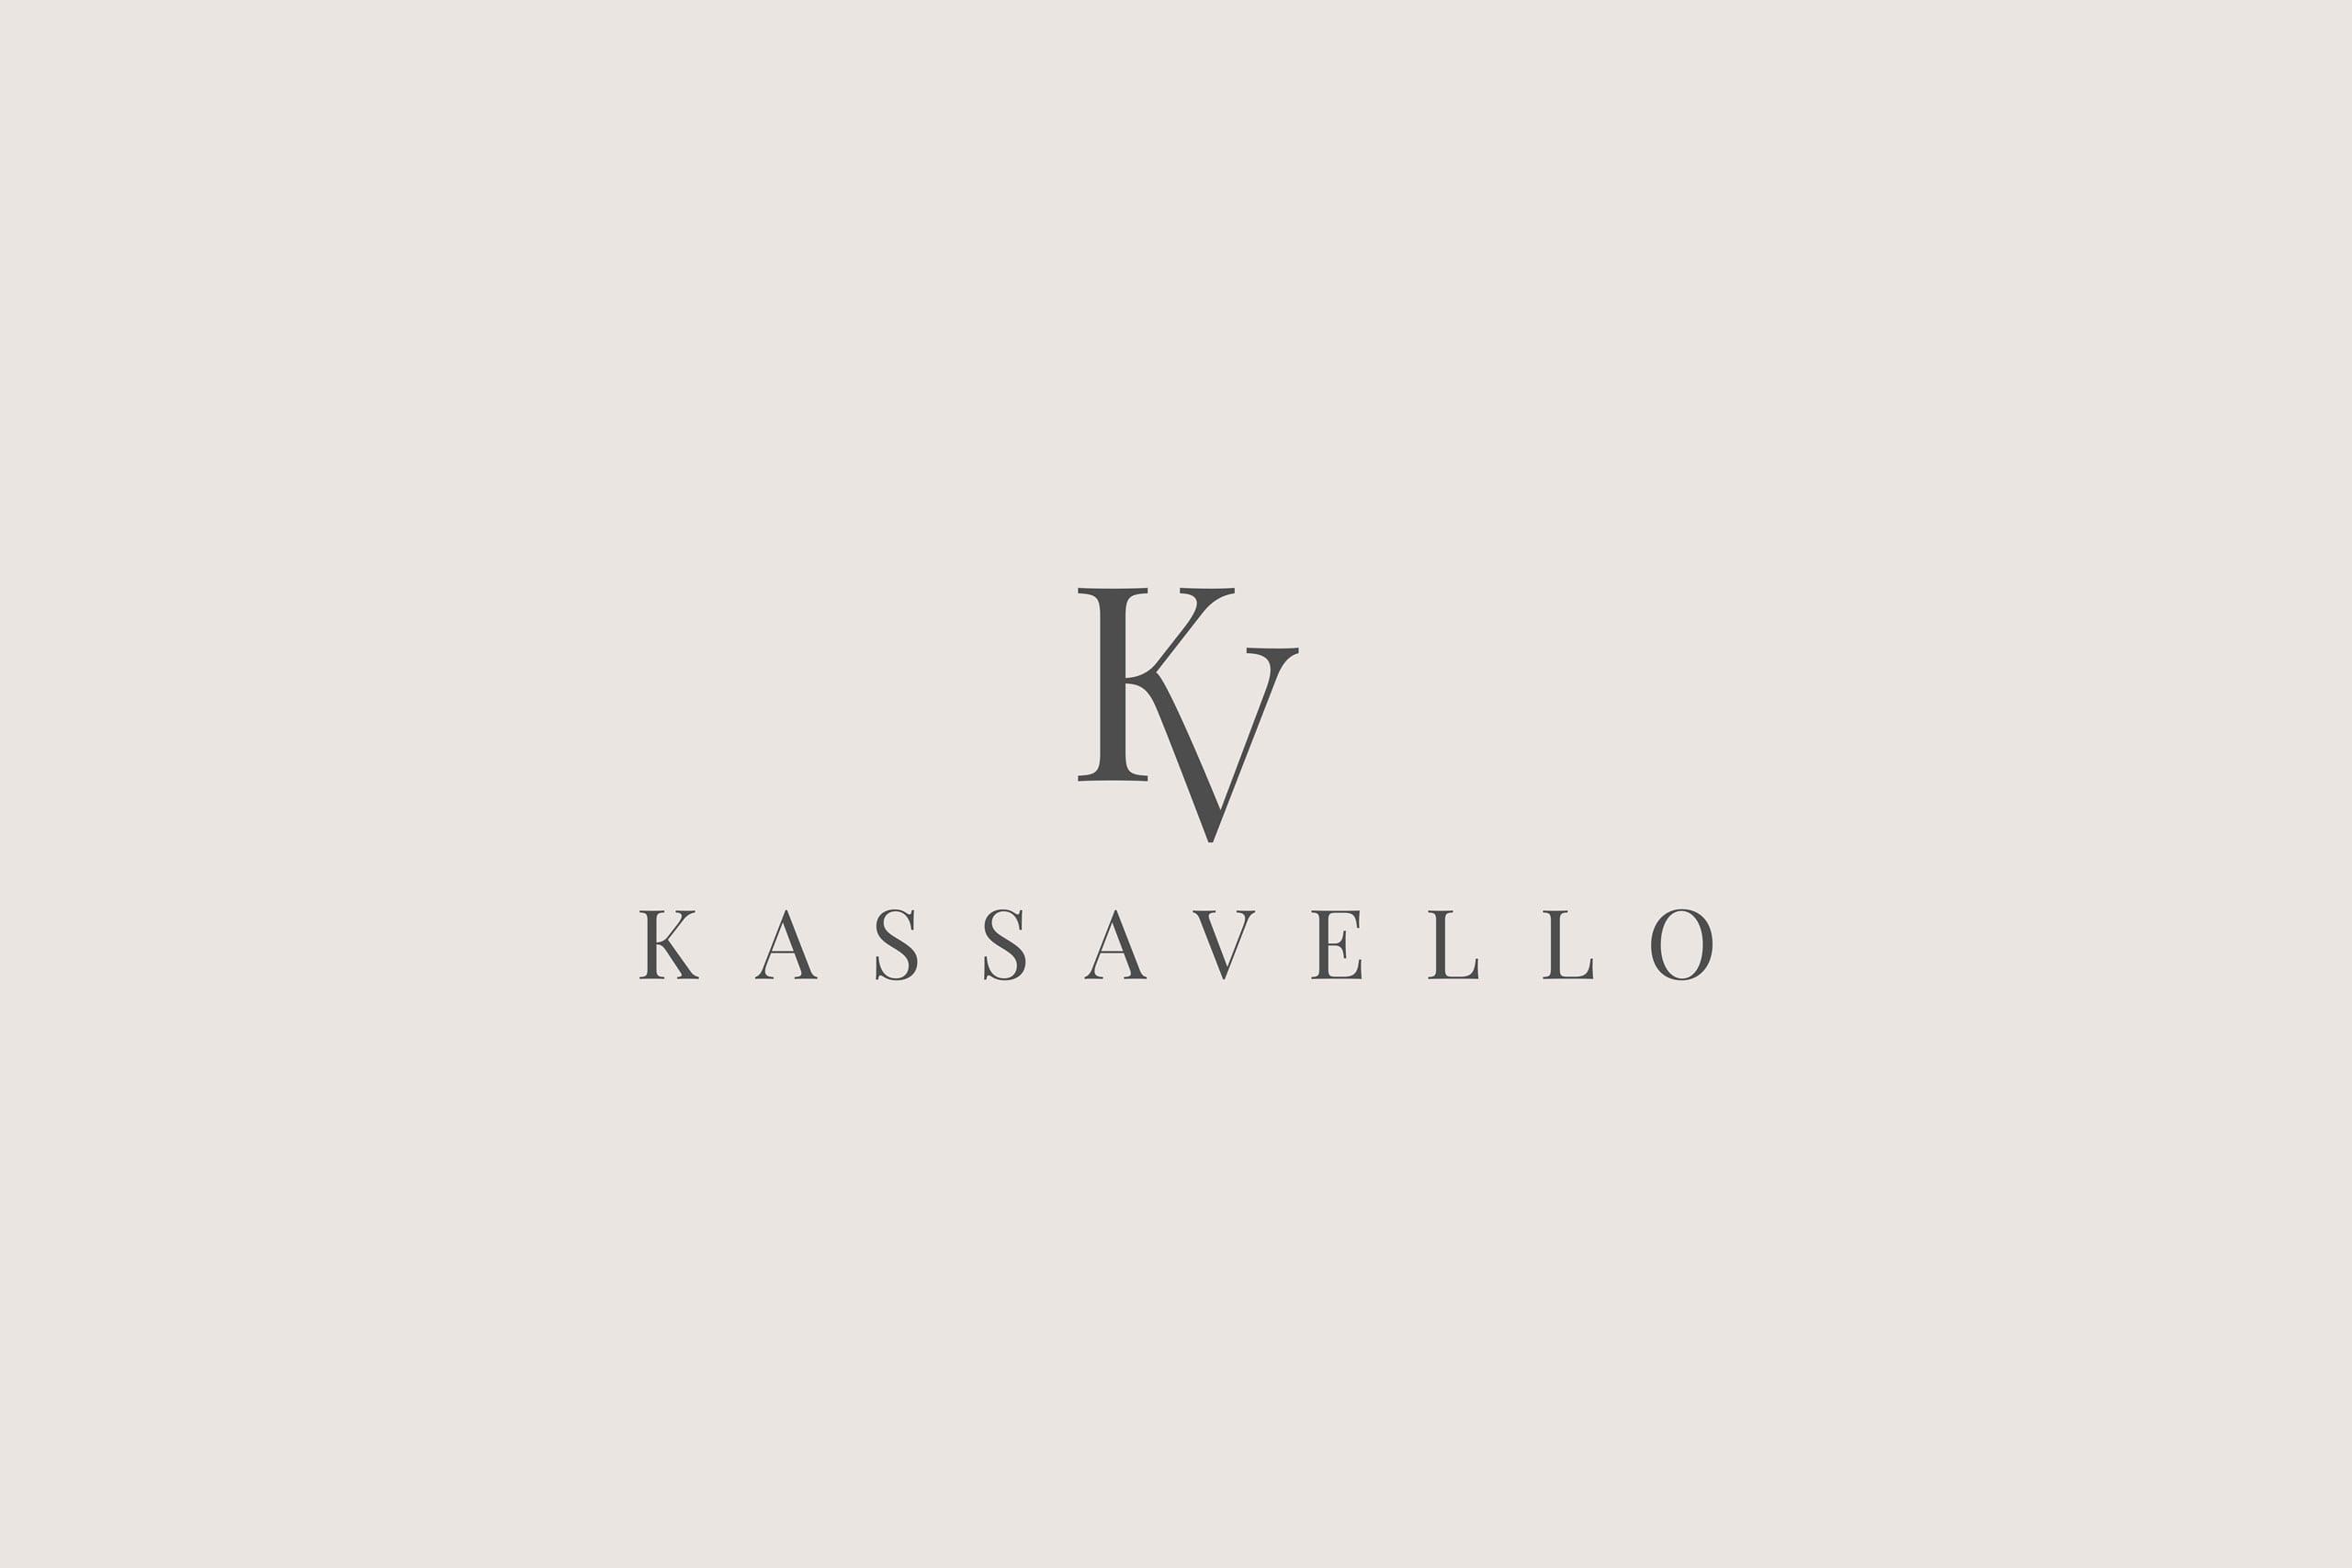 Luxury furniture logo design Kassavello brand name